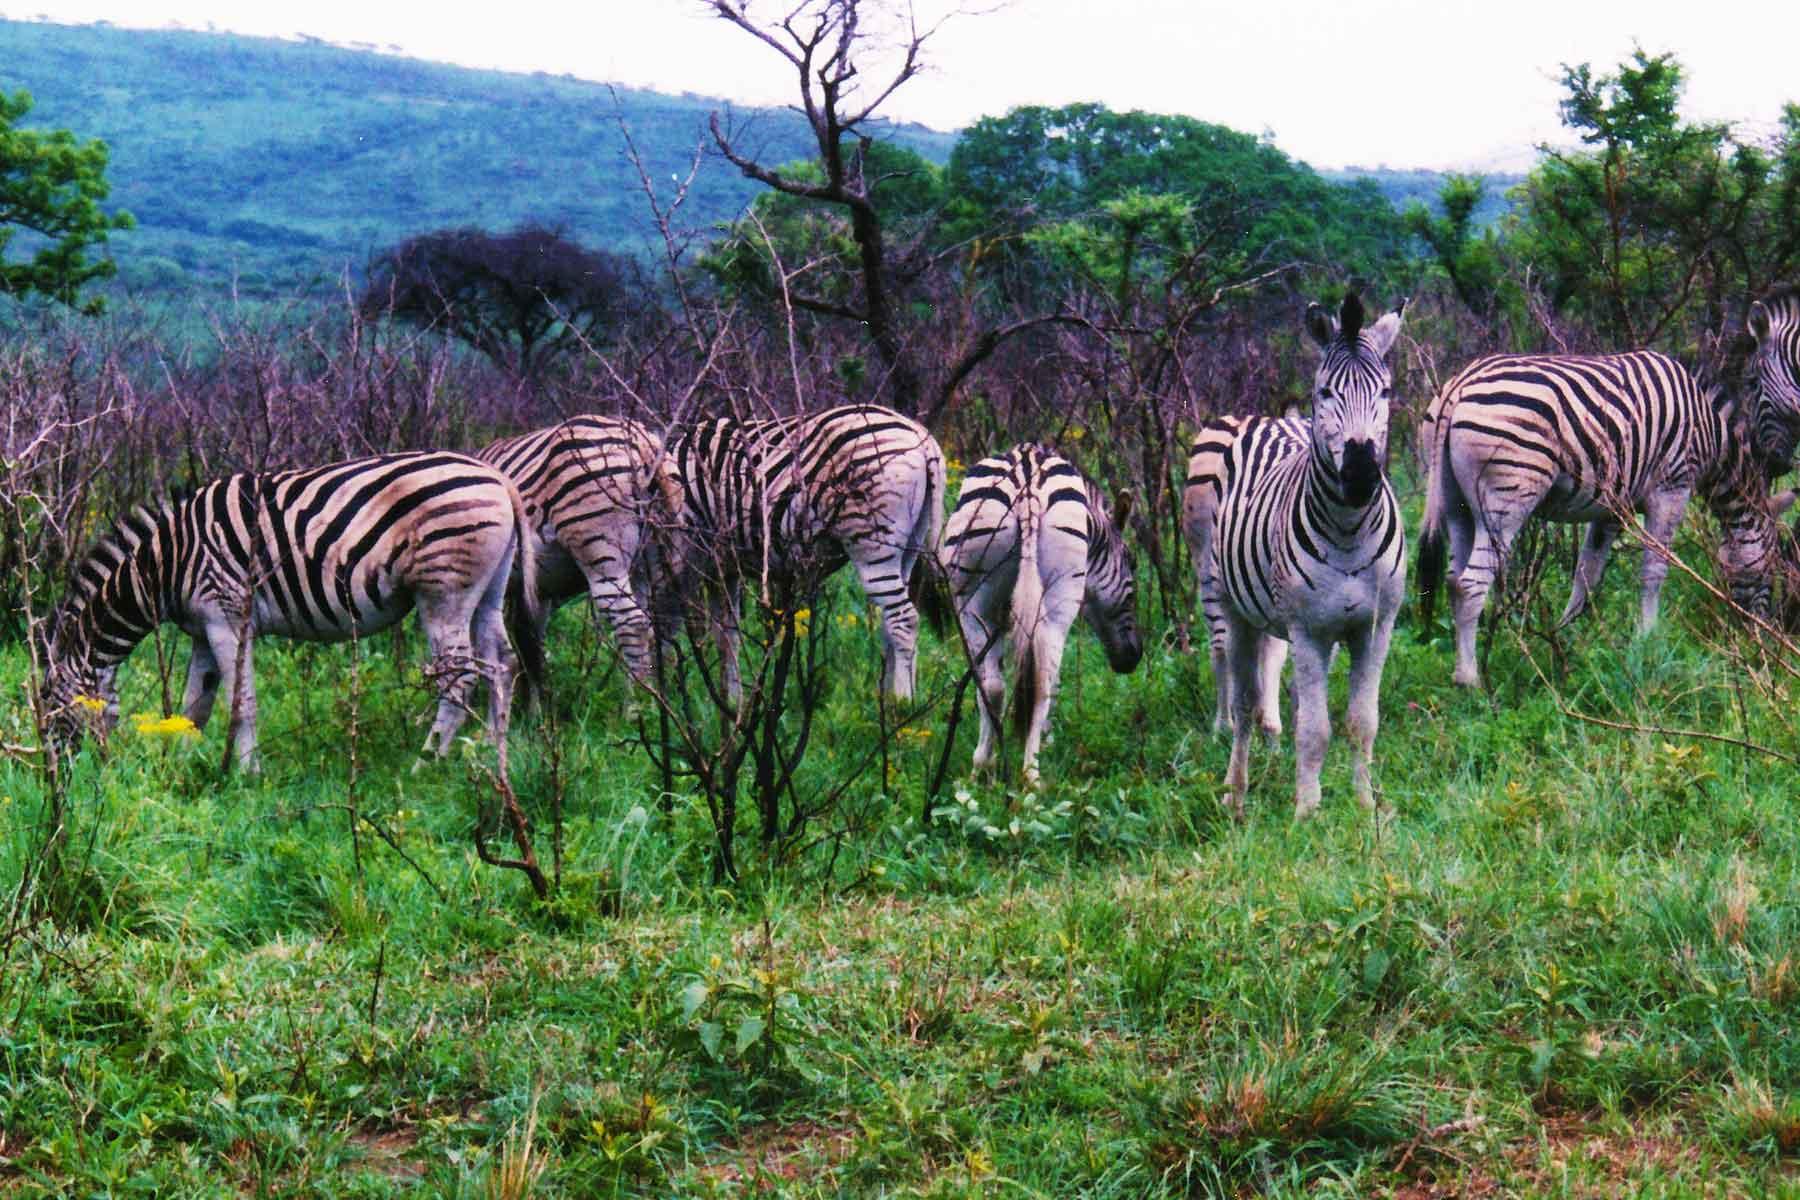 Zebras - Hluhluwe-Umfolozi Game Reserve - Steven Andrew Martin - South Africa Photo Journal - International education online